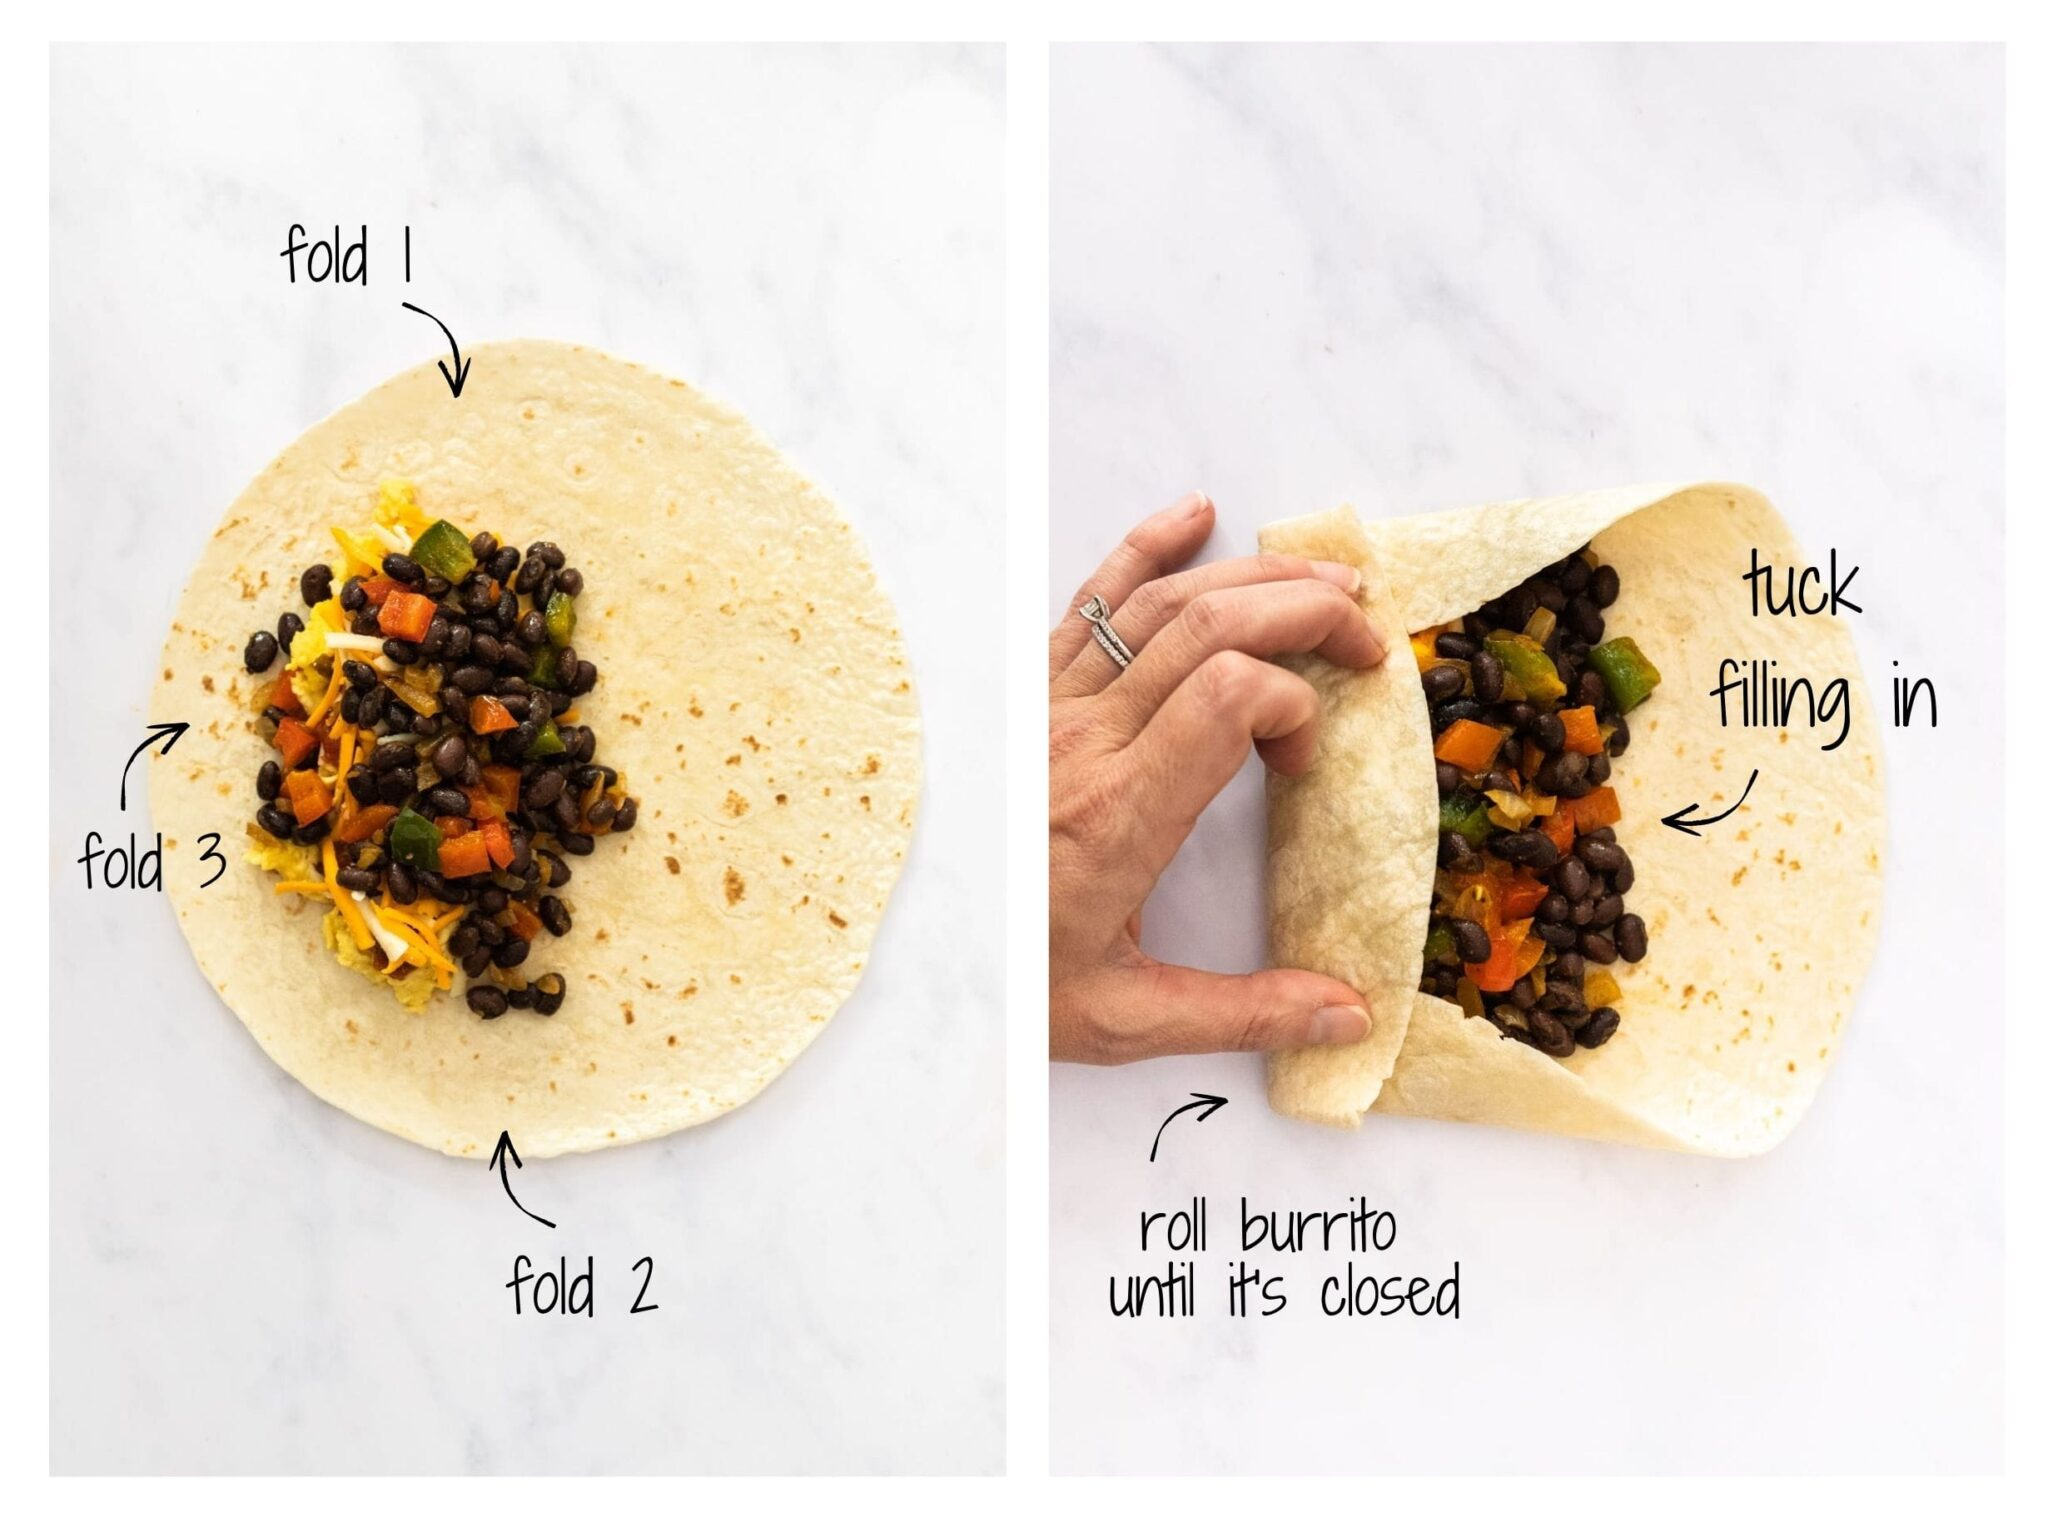 A visual walkthrough on how to fold a burrrito.